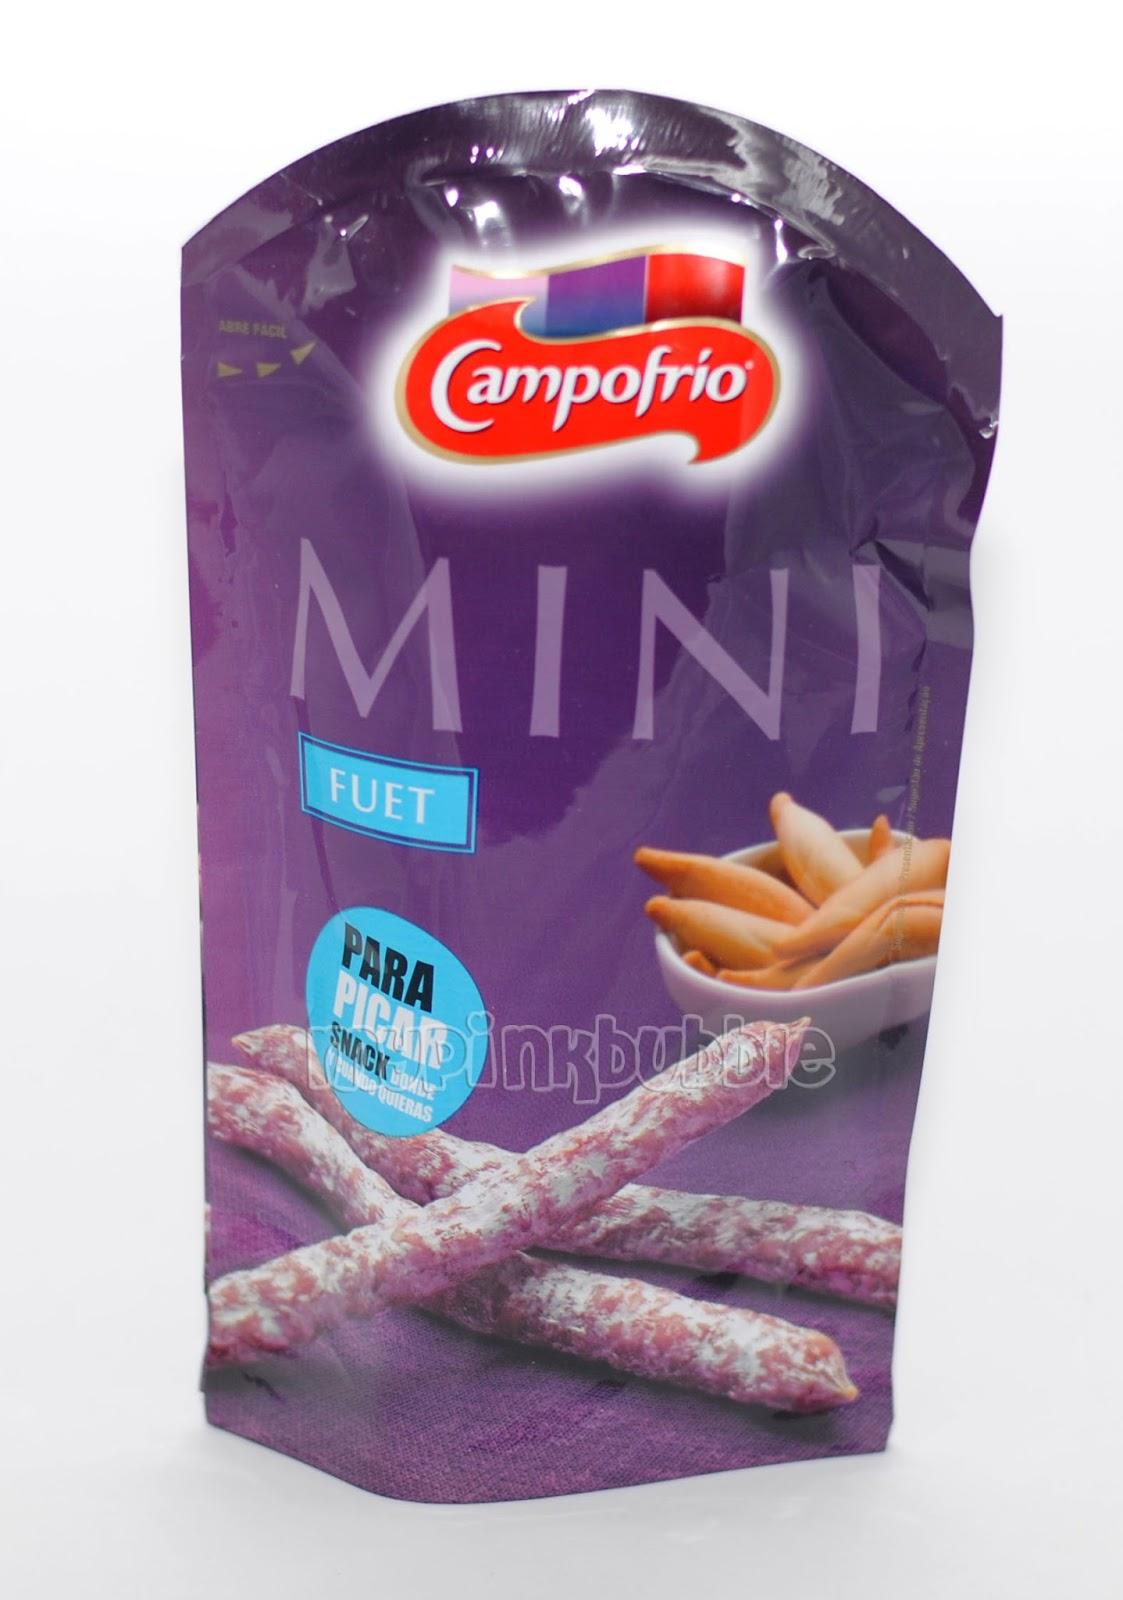 Campofrío minifuet